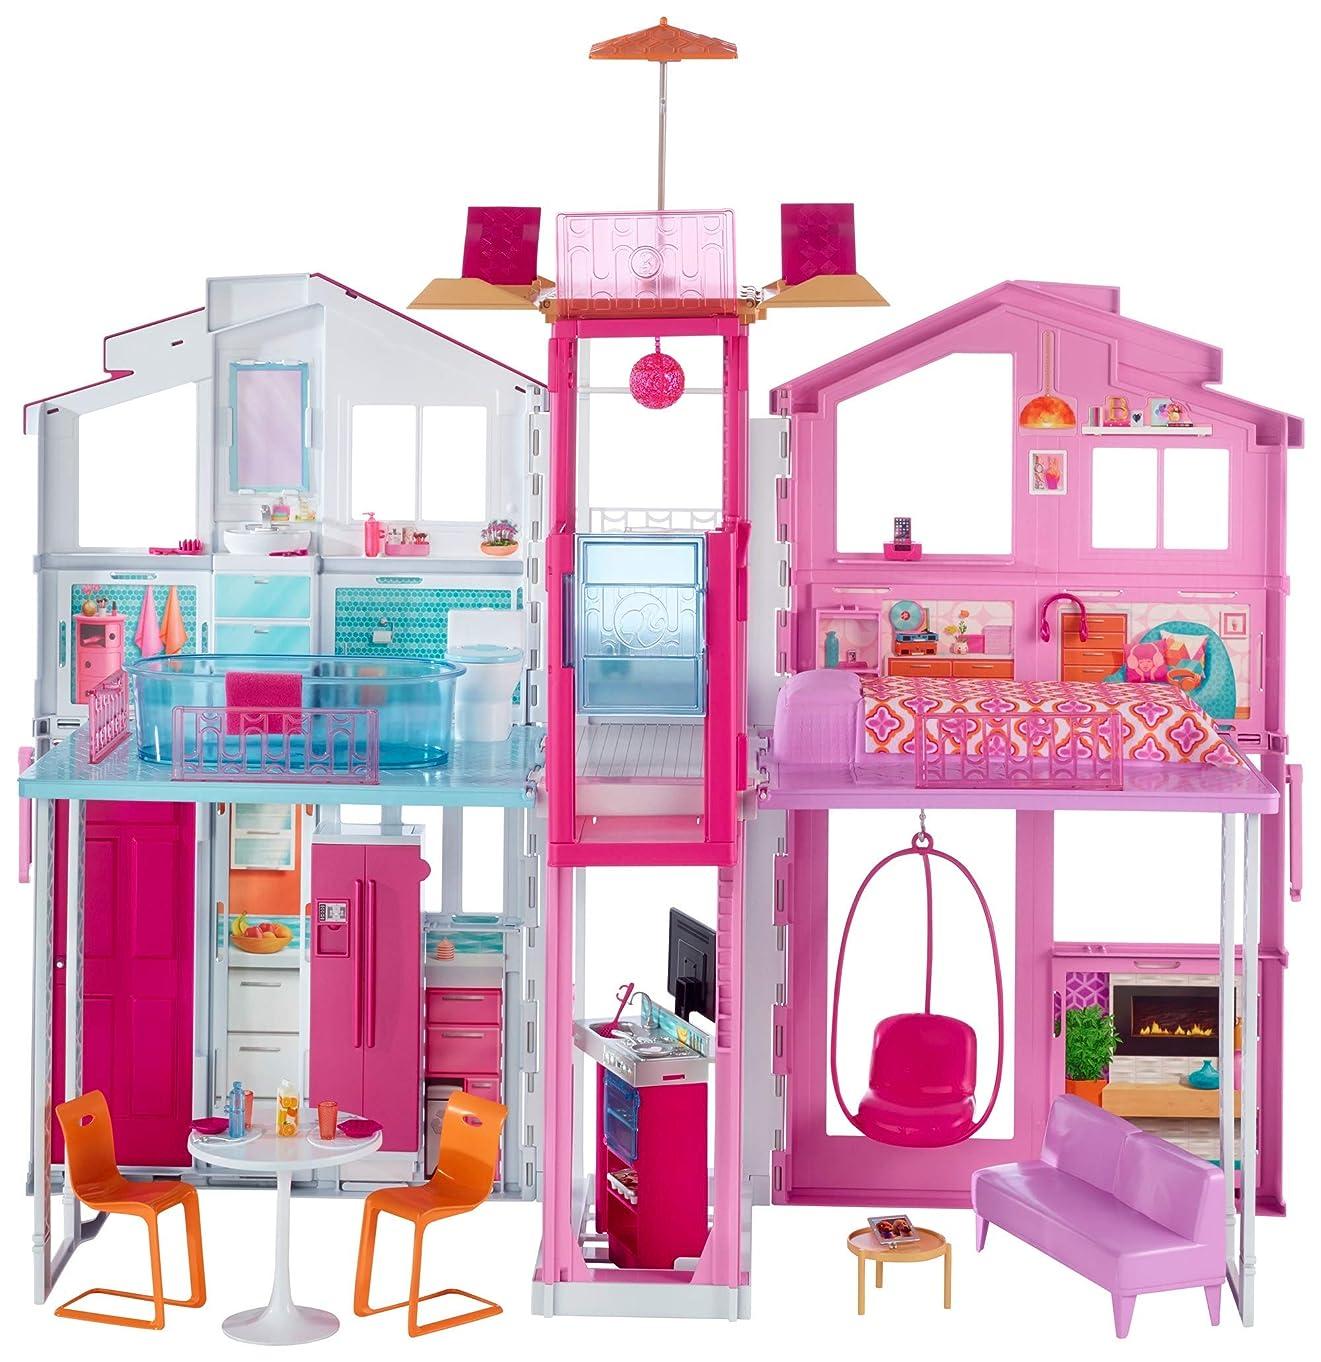 Barbie 3-Story Townhouse [Amazon Exclusive]